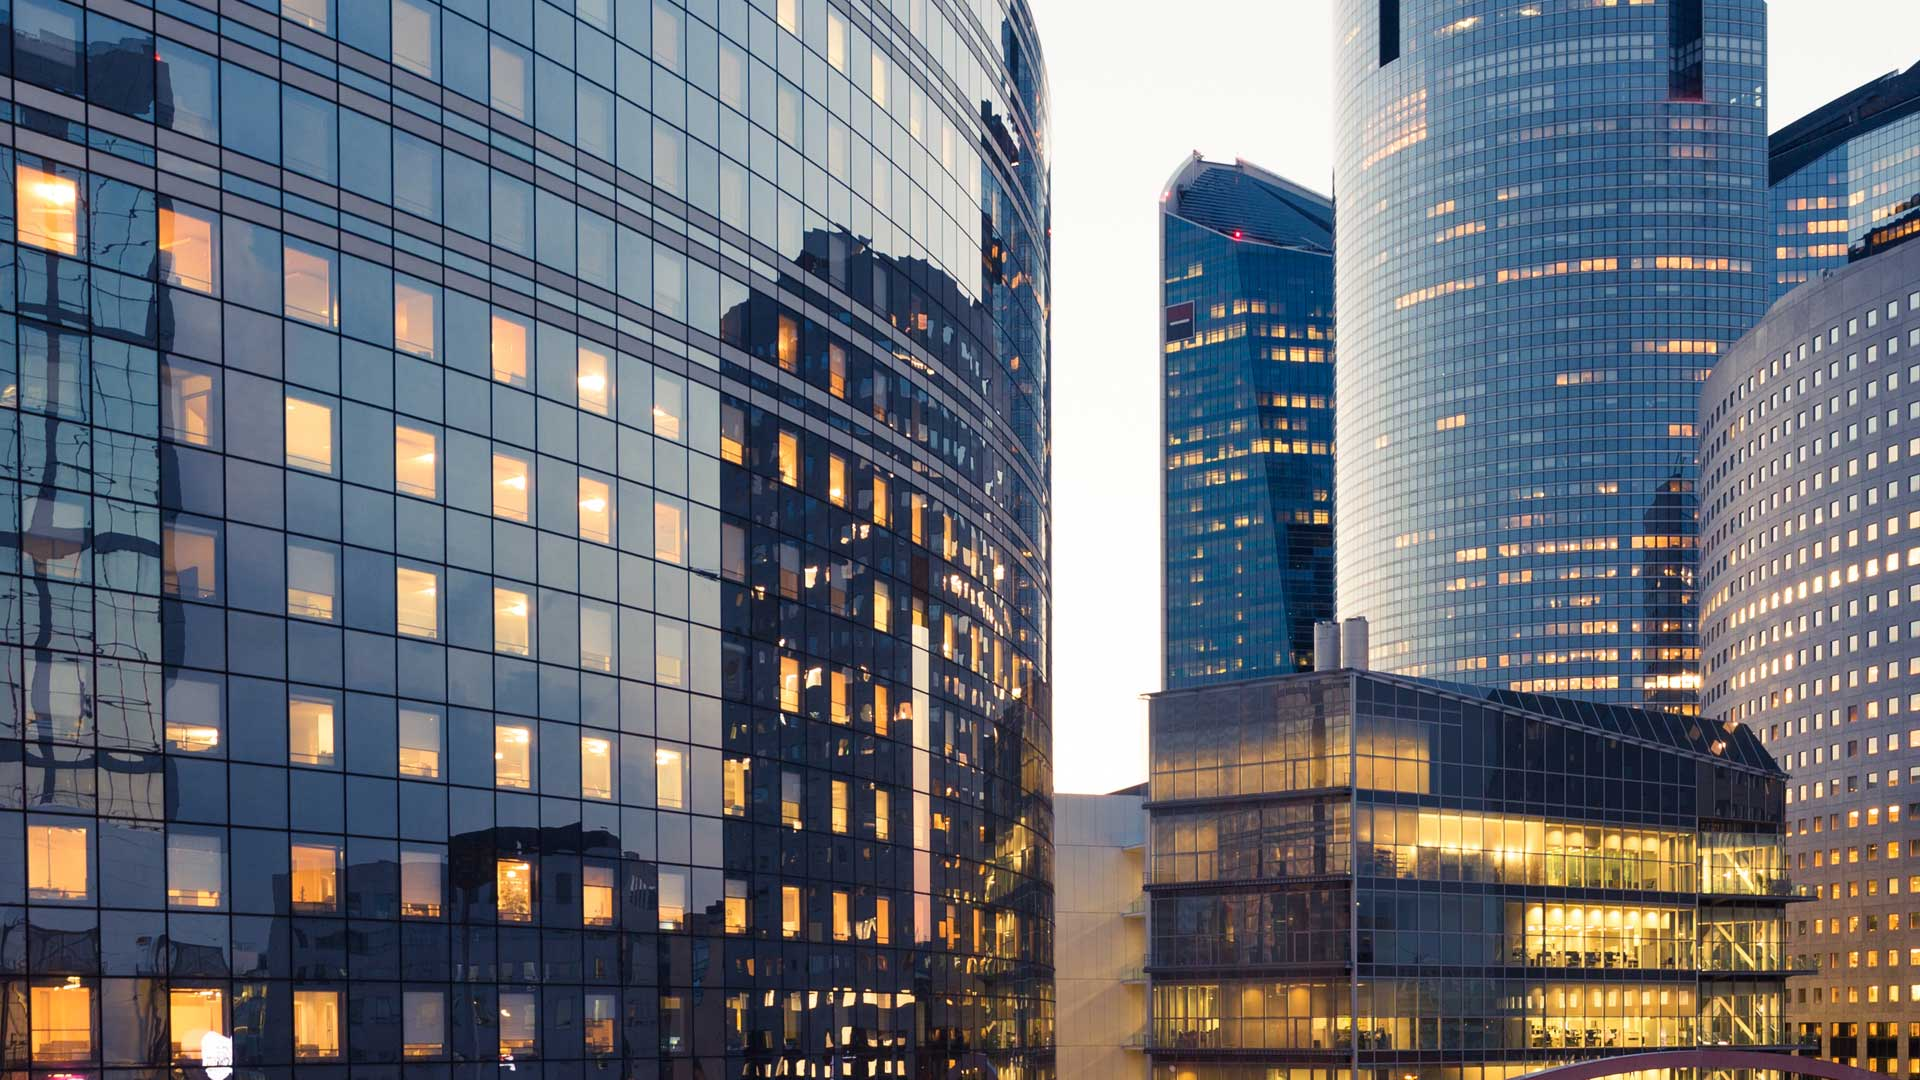 European central bank announces pandemic emergency purchase program